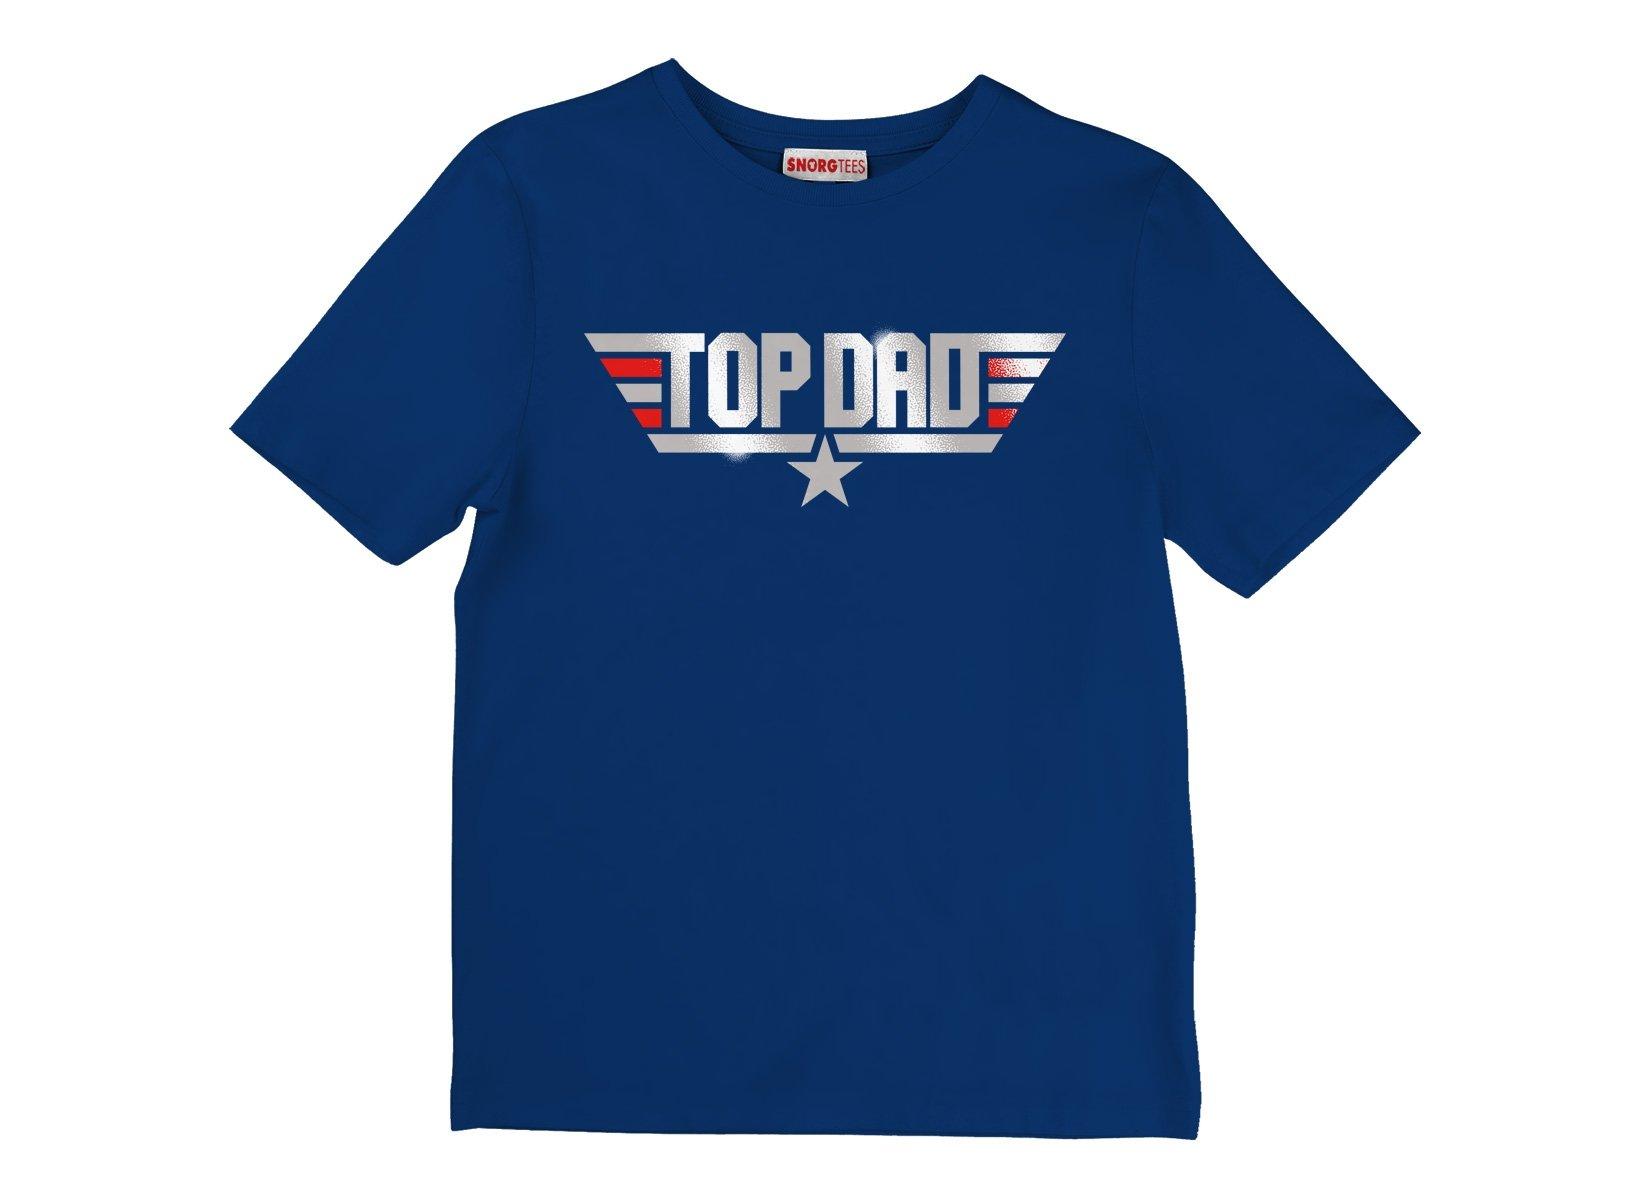 Top Dad on Kids T-Shirt